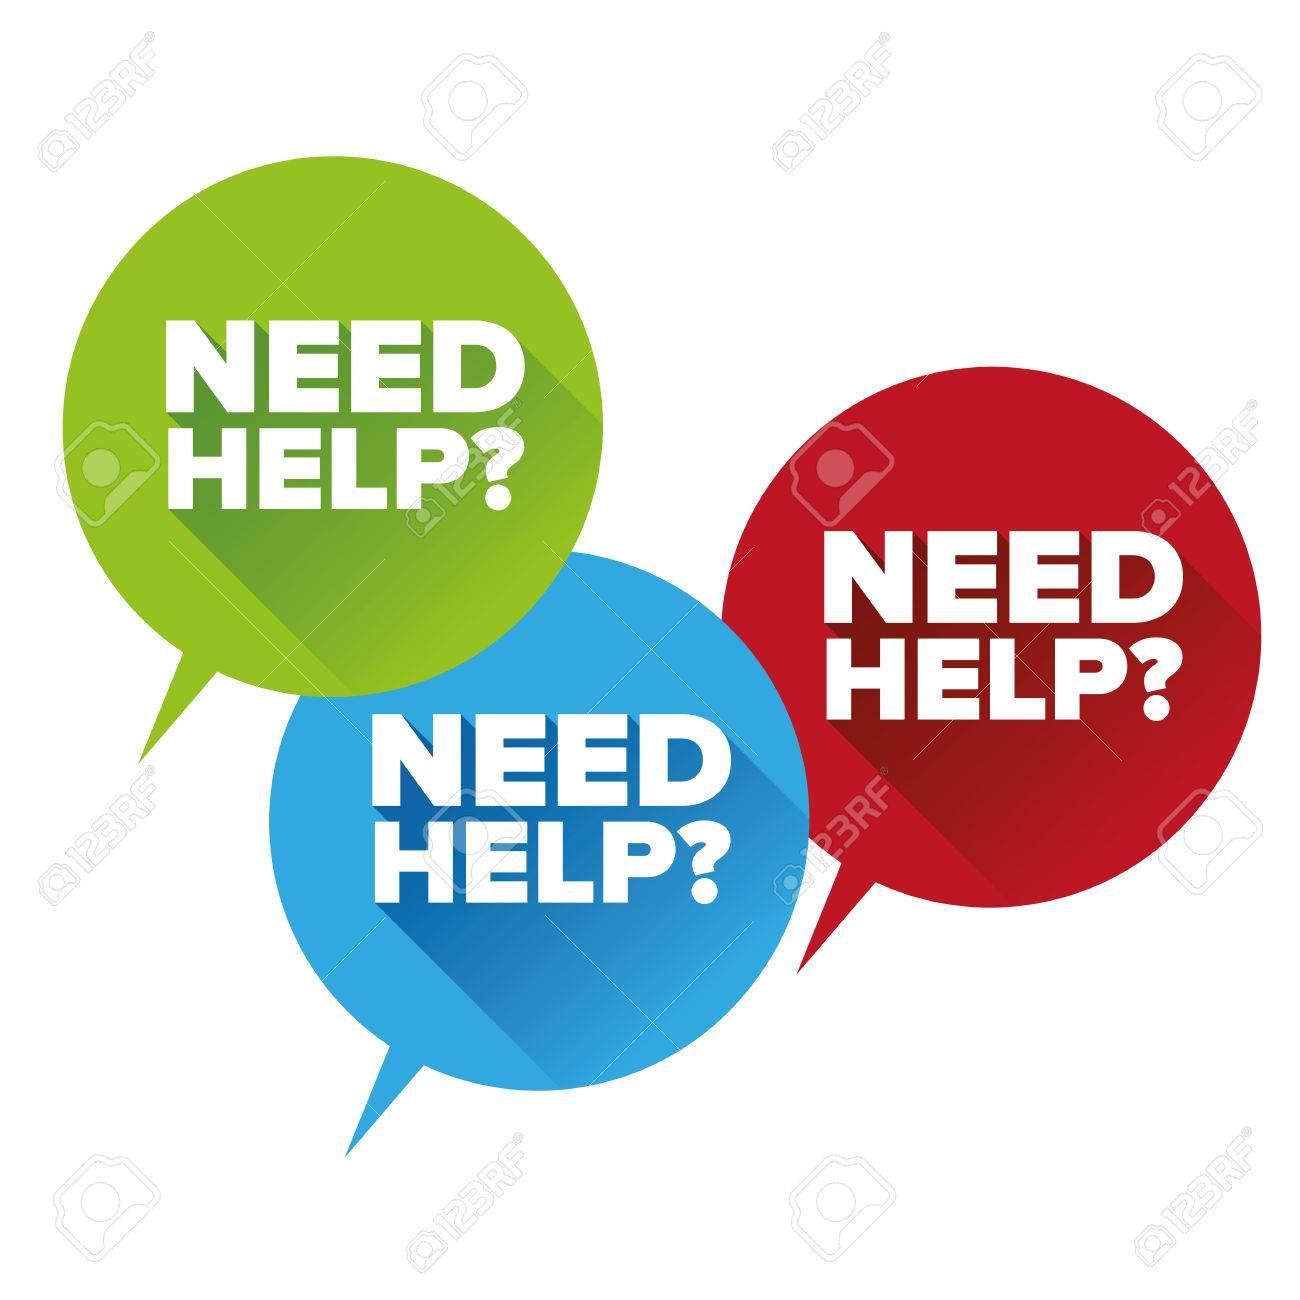 Need help..?